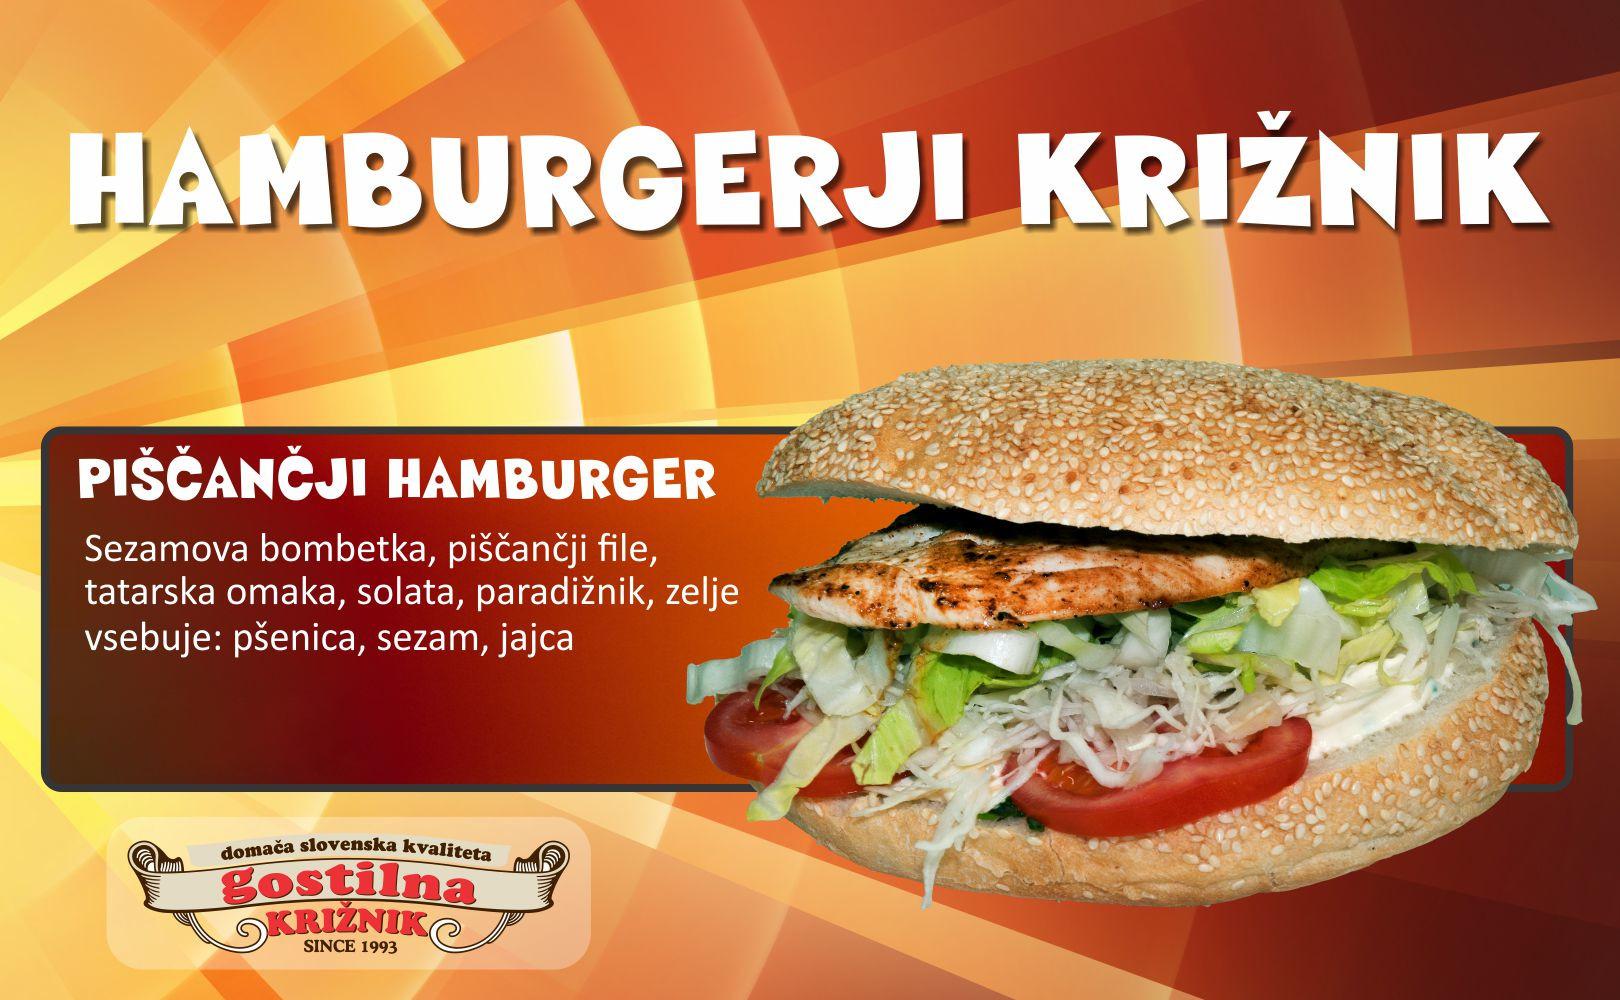 Piščančji hamburger